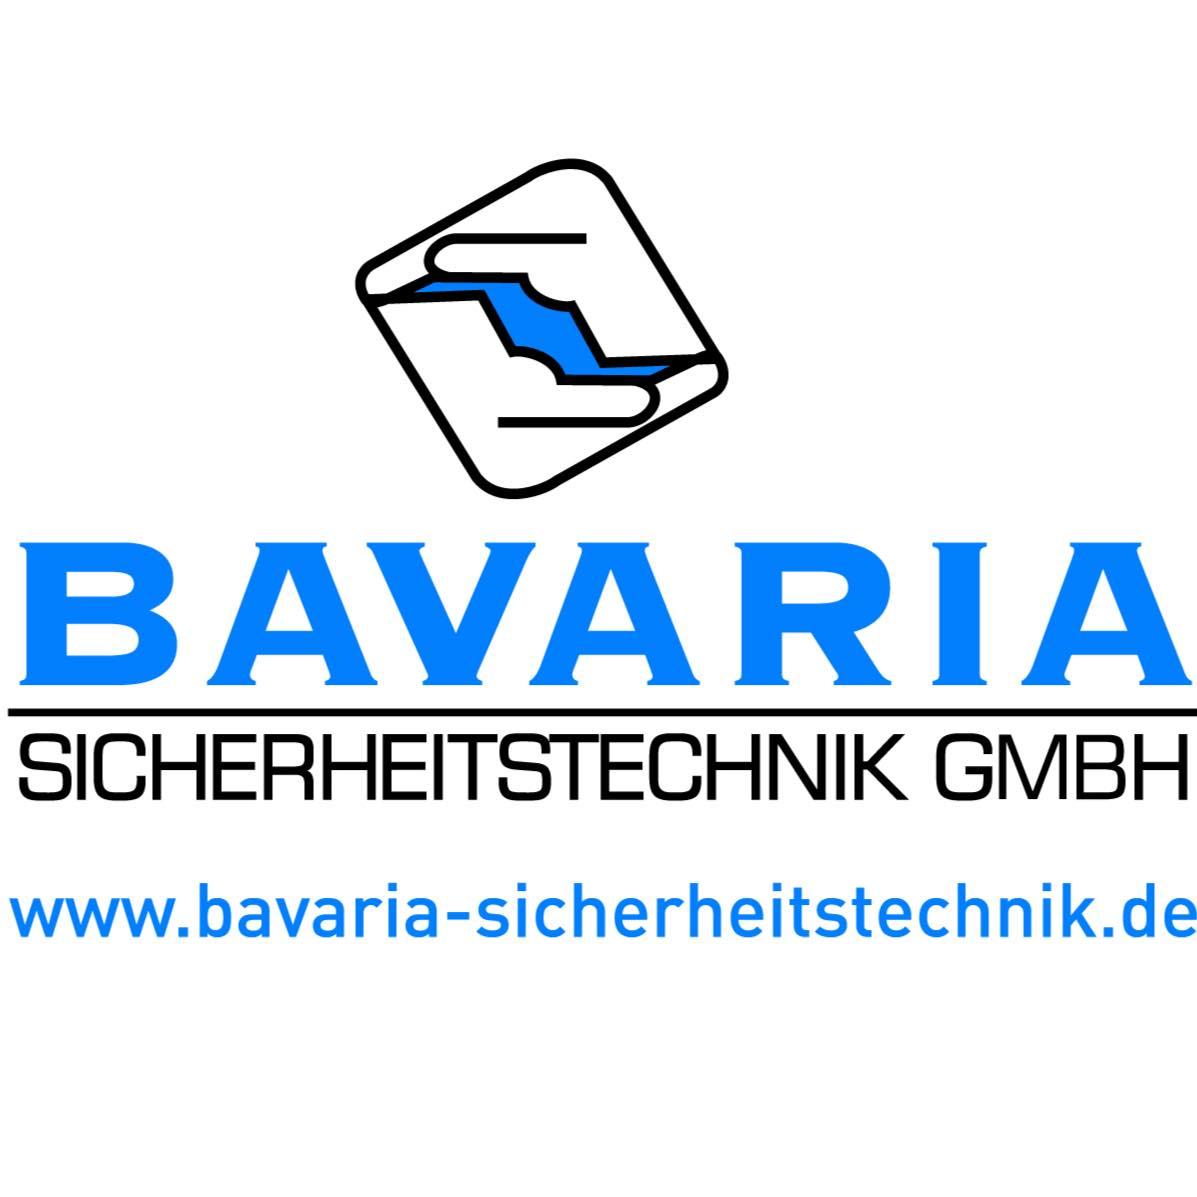 Bavaria Sicherheitstechnik GmbH